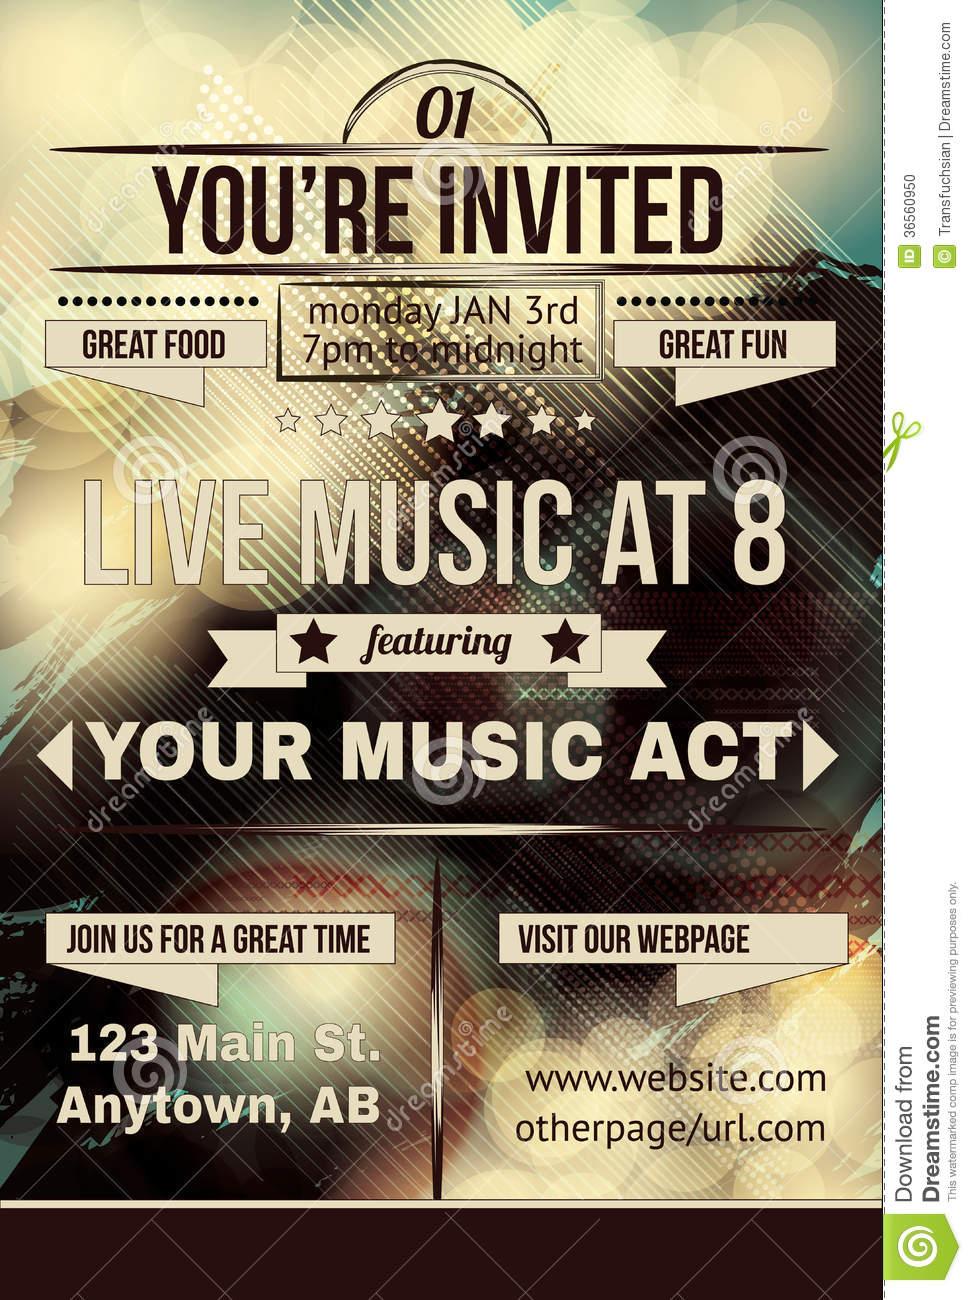 Invitation Flyer Design